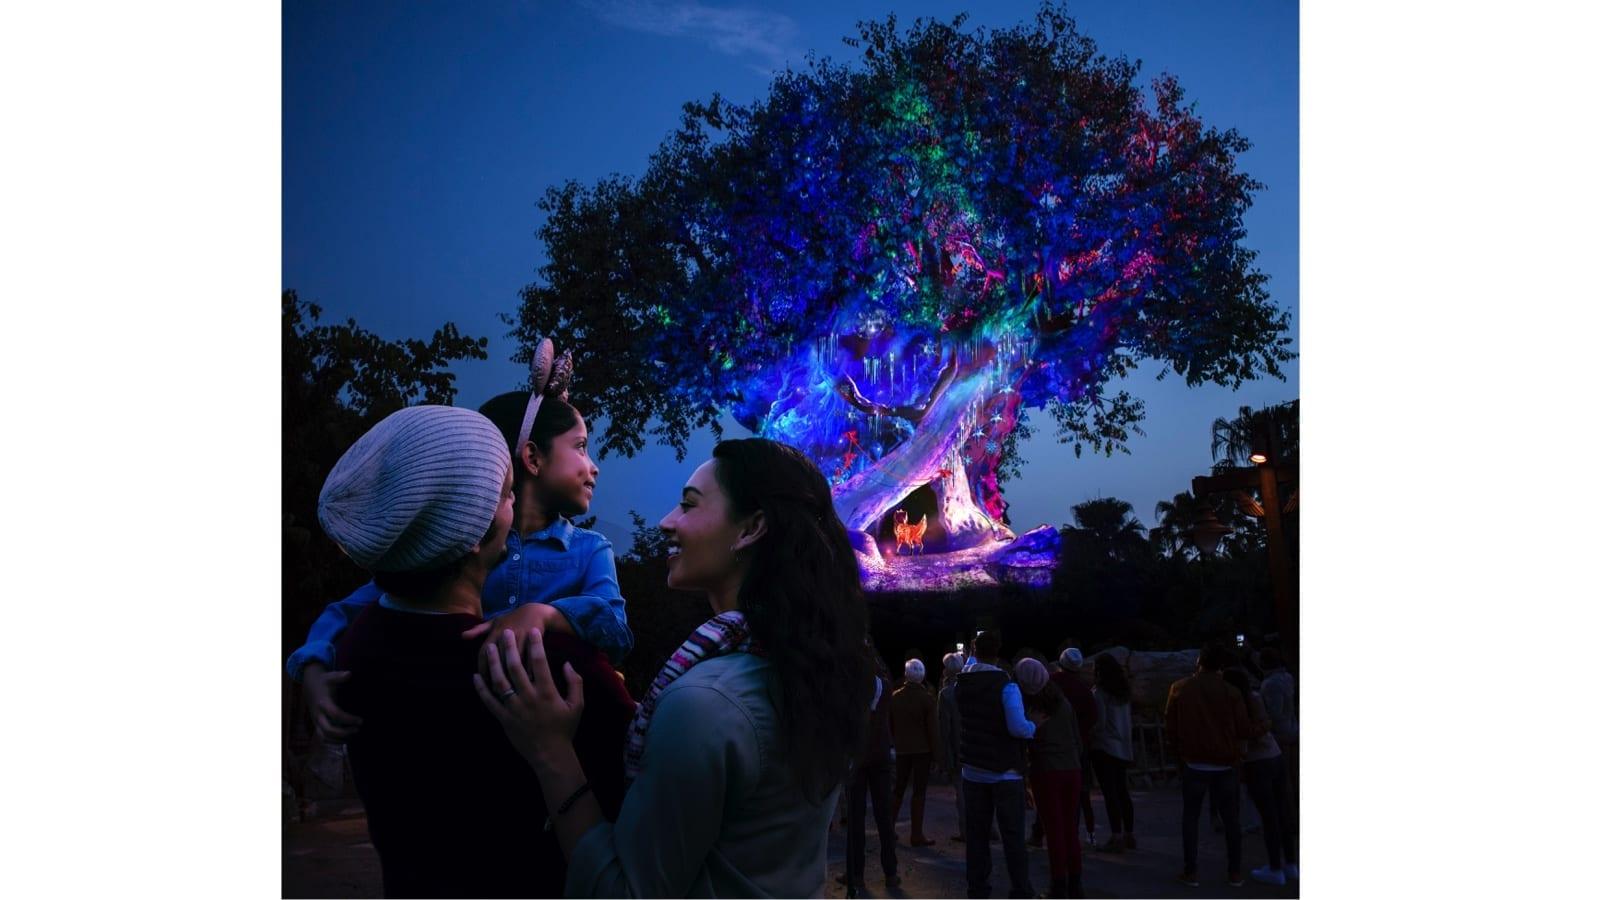 New Holiday Decor Planned for Disney's Animal Kingdom This Season